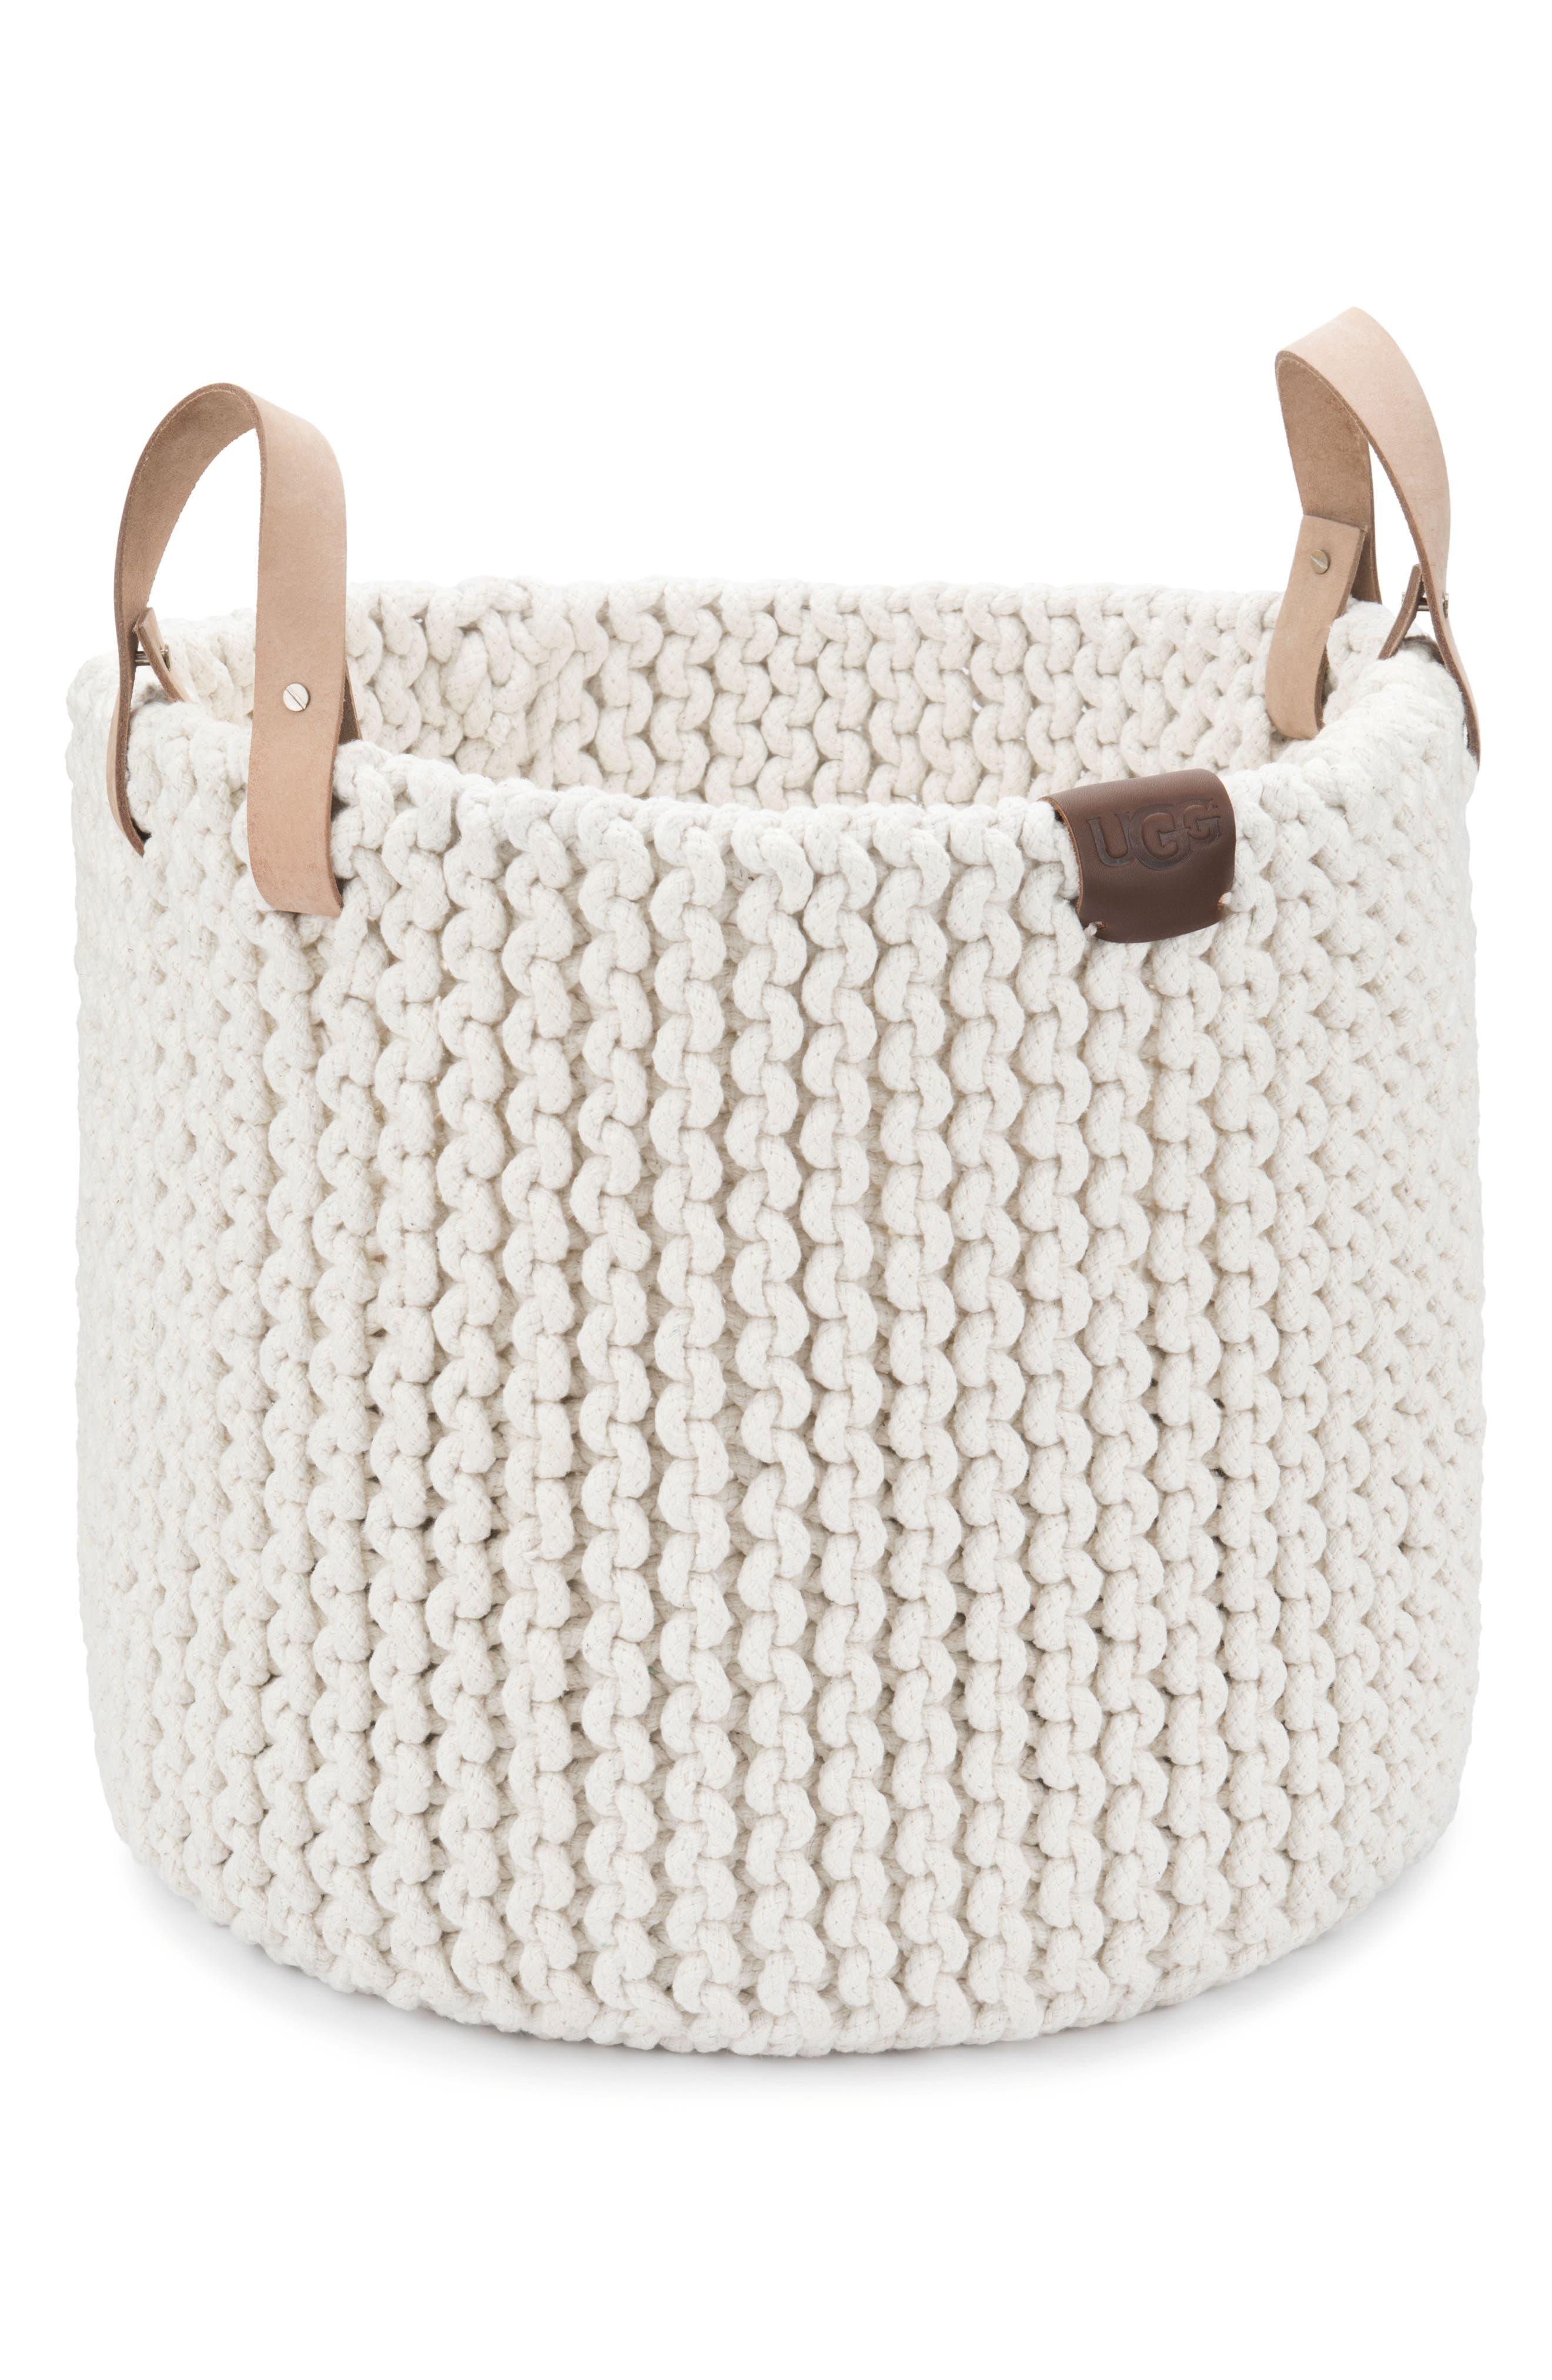 Tulum Rope Basket,                             Main thumbnail 1, color,                             Natural